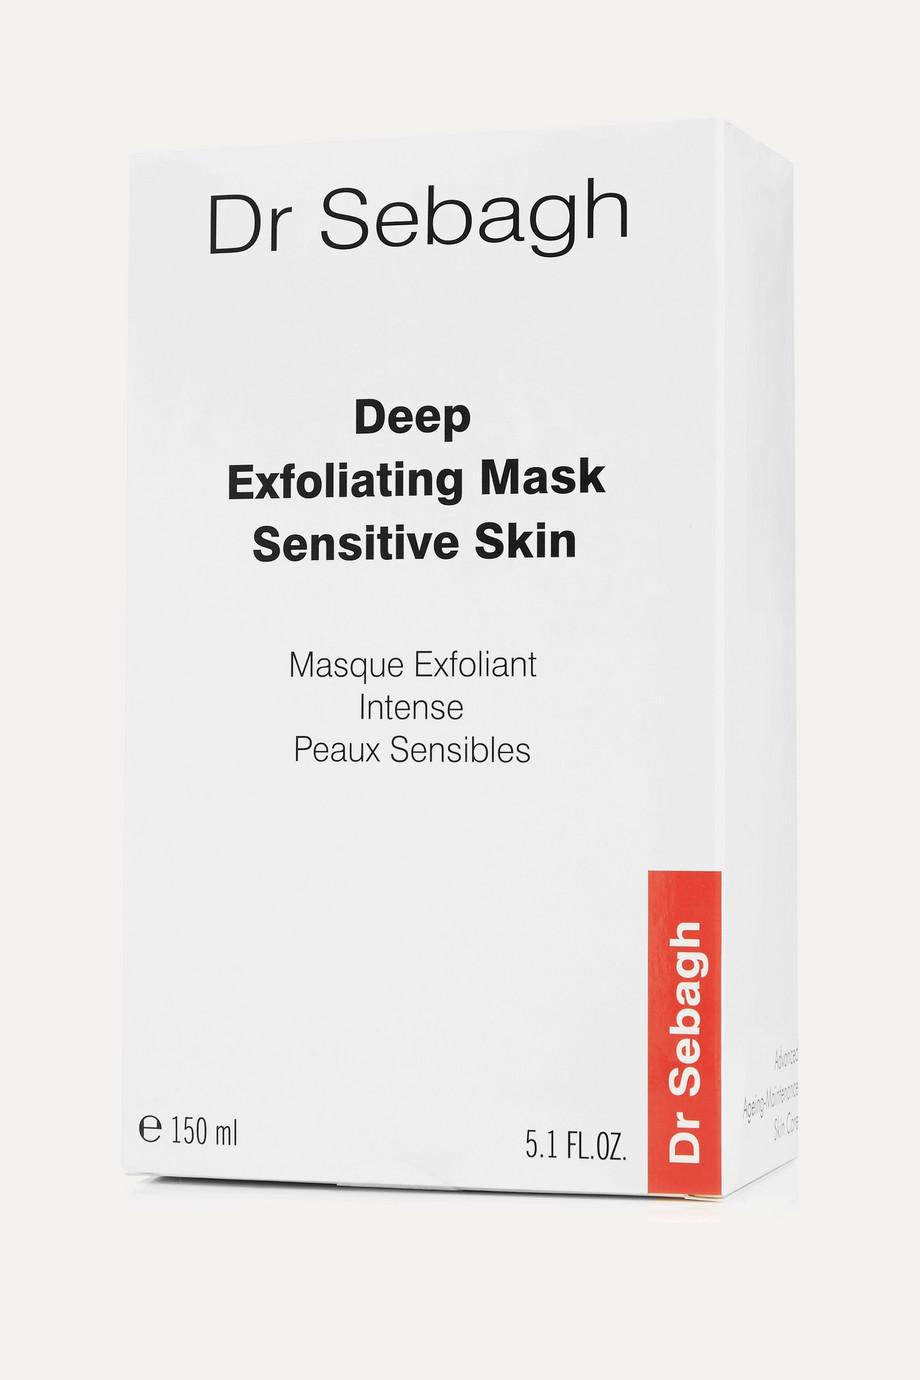 Dr Sebagh Deep Exfoliating Mask Sensitive Skin, 150ml